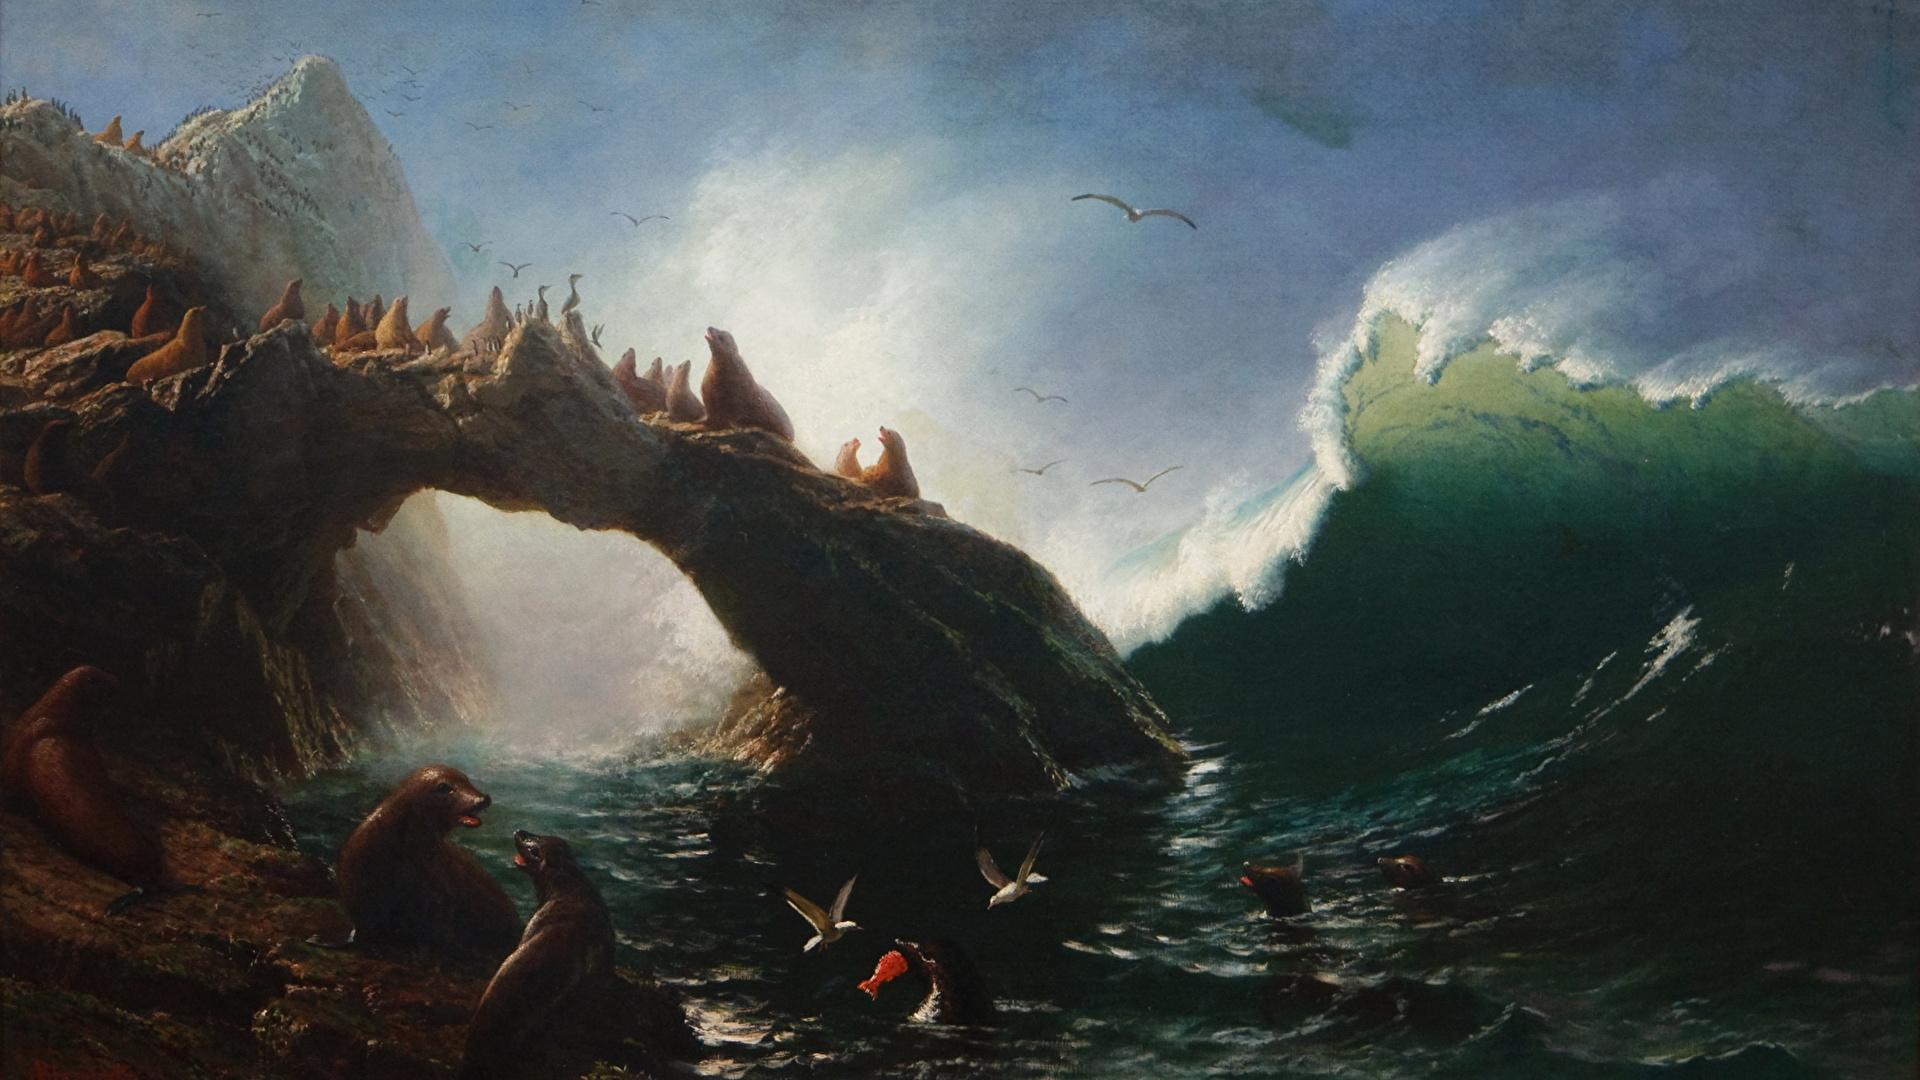 Wallpaper Seals Albert Bierstadt Farallon Island Waves